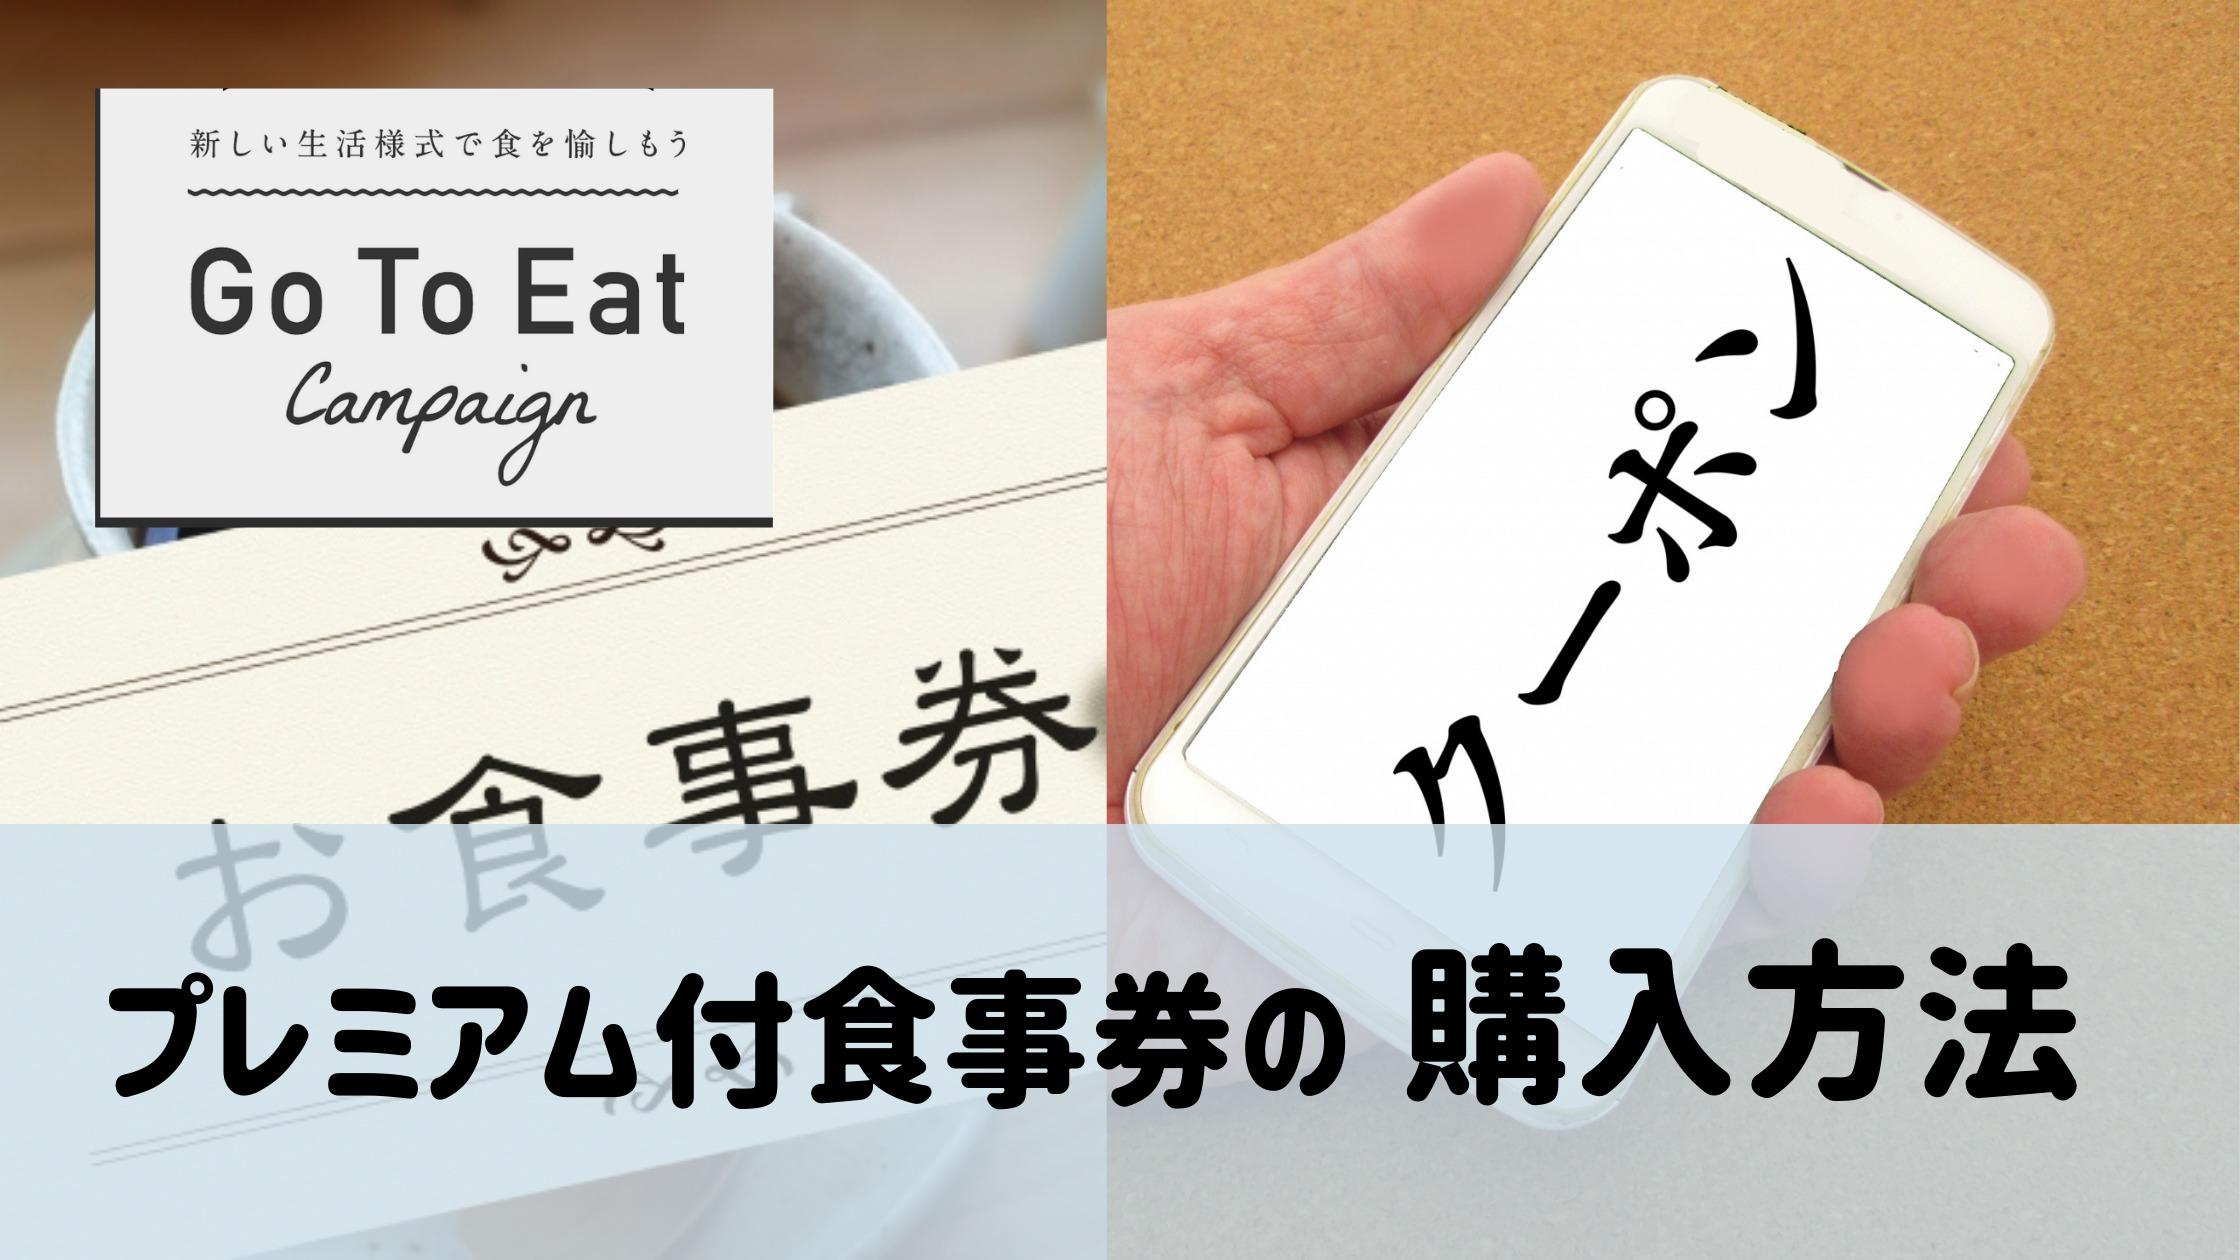 gotoeat,アイキャッチ,食事券